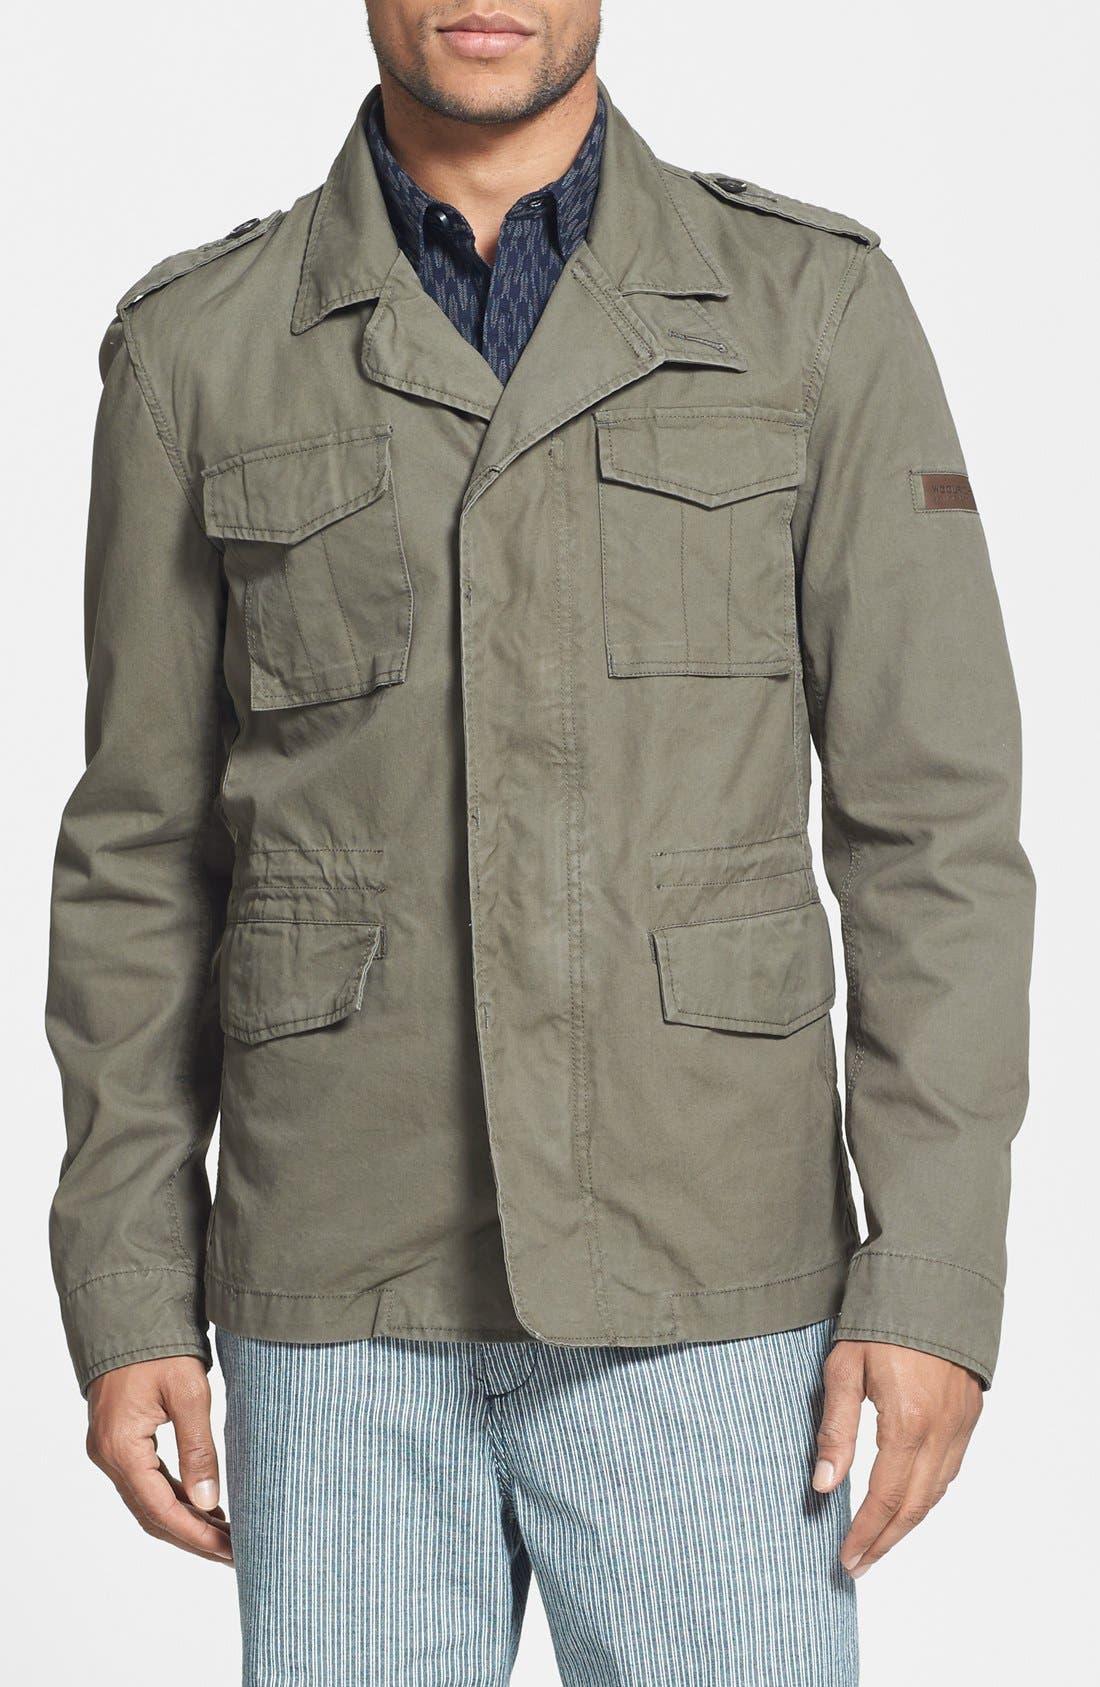 Main Image - Woolrich 'M43' Waxed Cotton Field Jacket